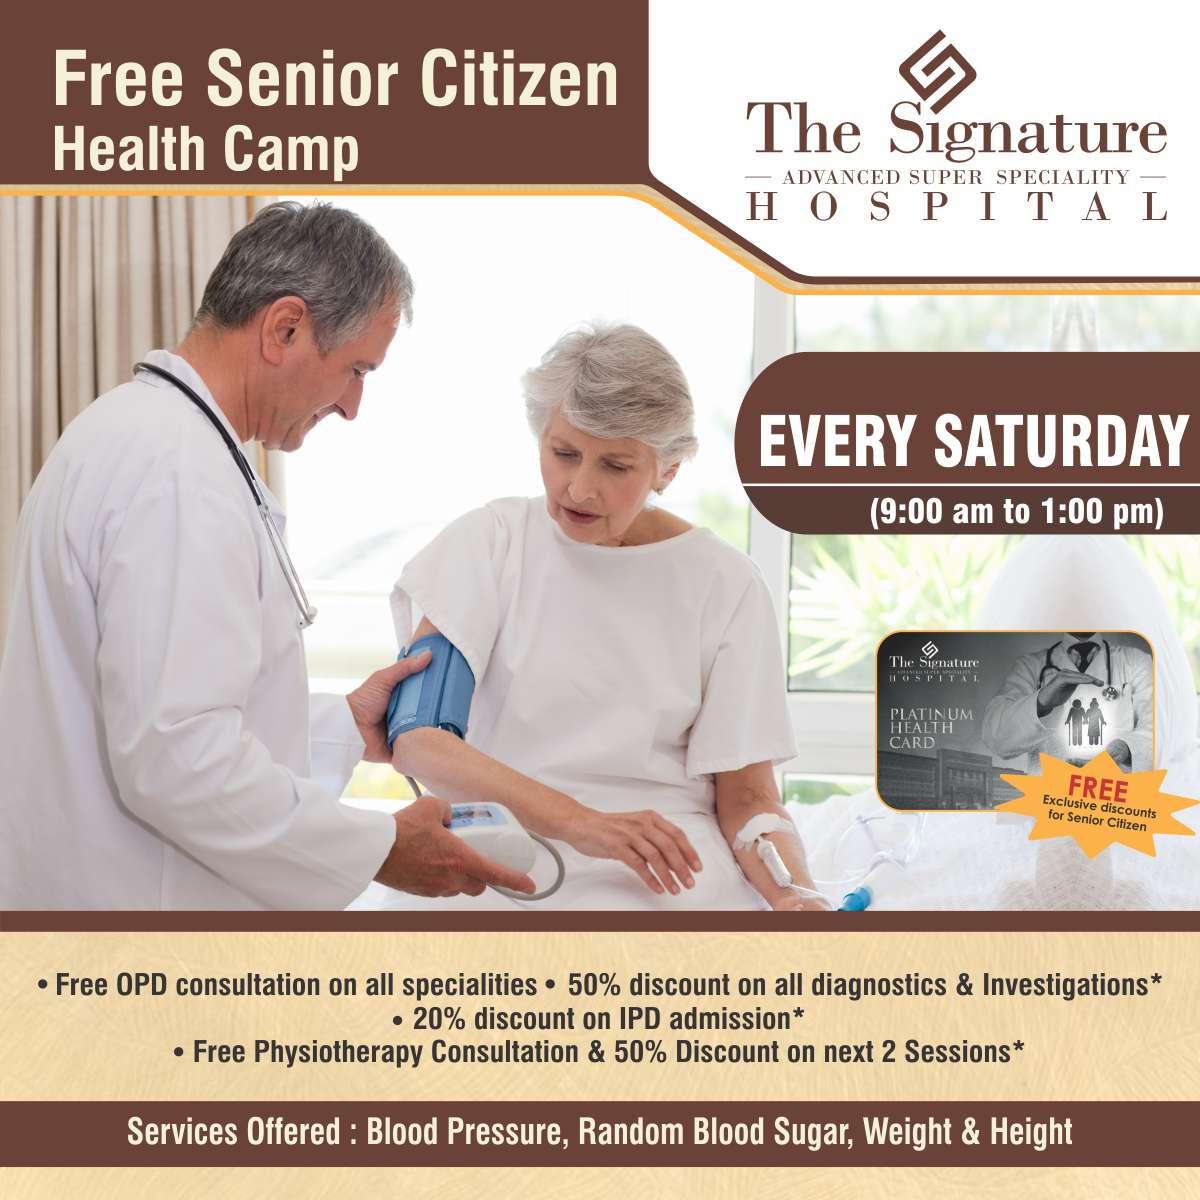 Free Senior Citizen Health Camp